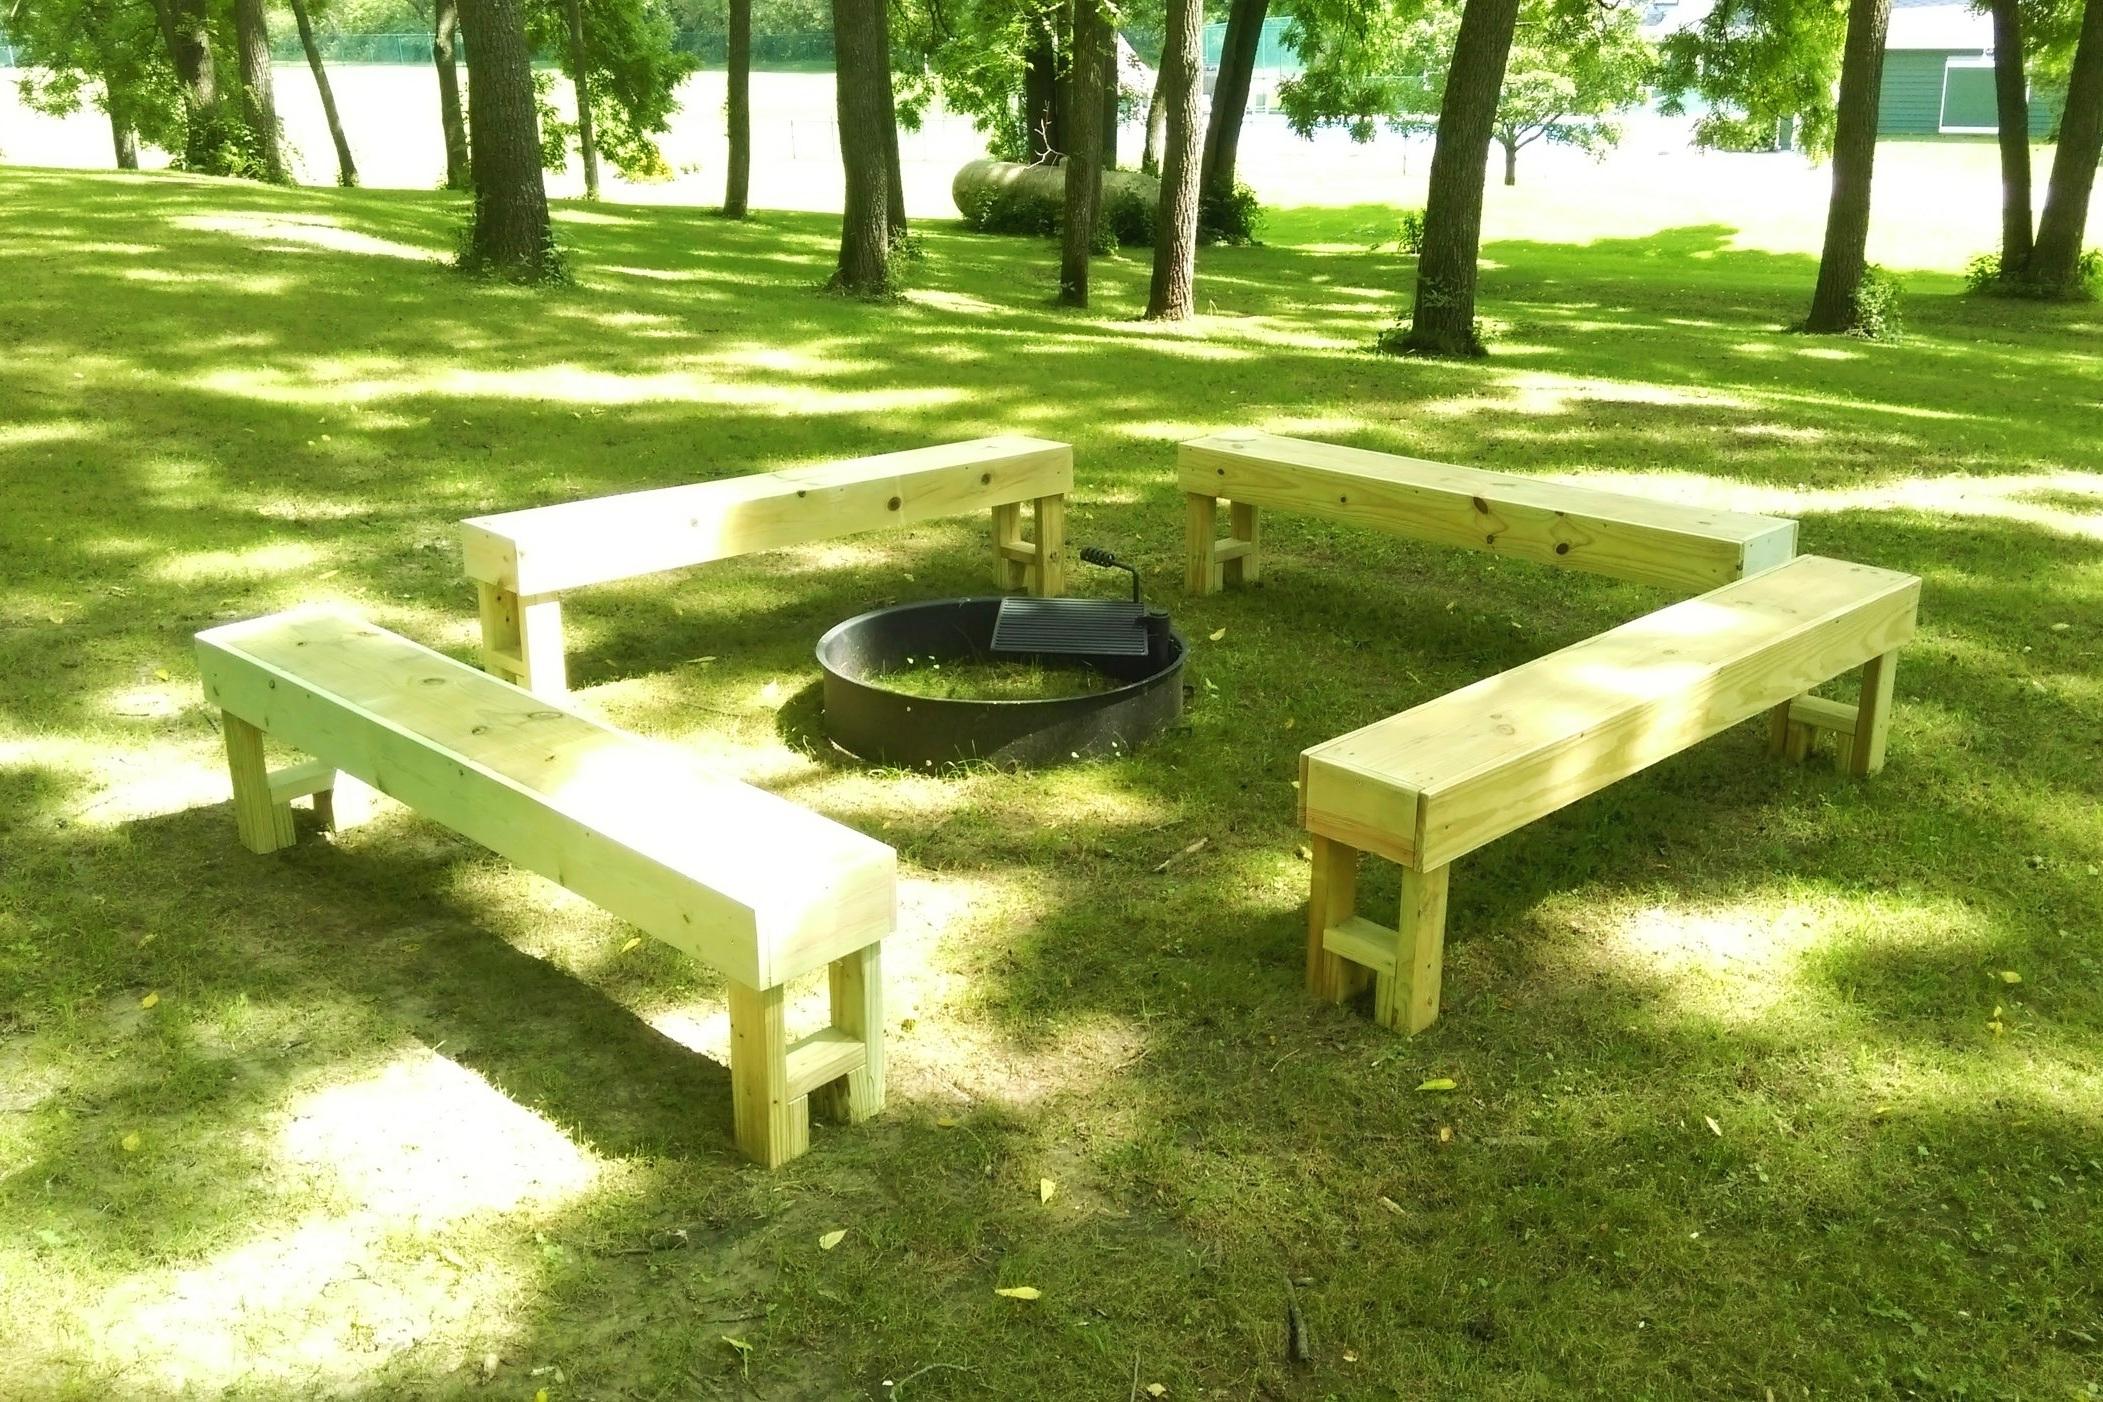 Bonfire Pits (x3)